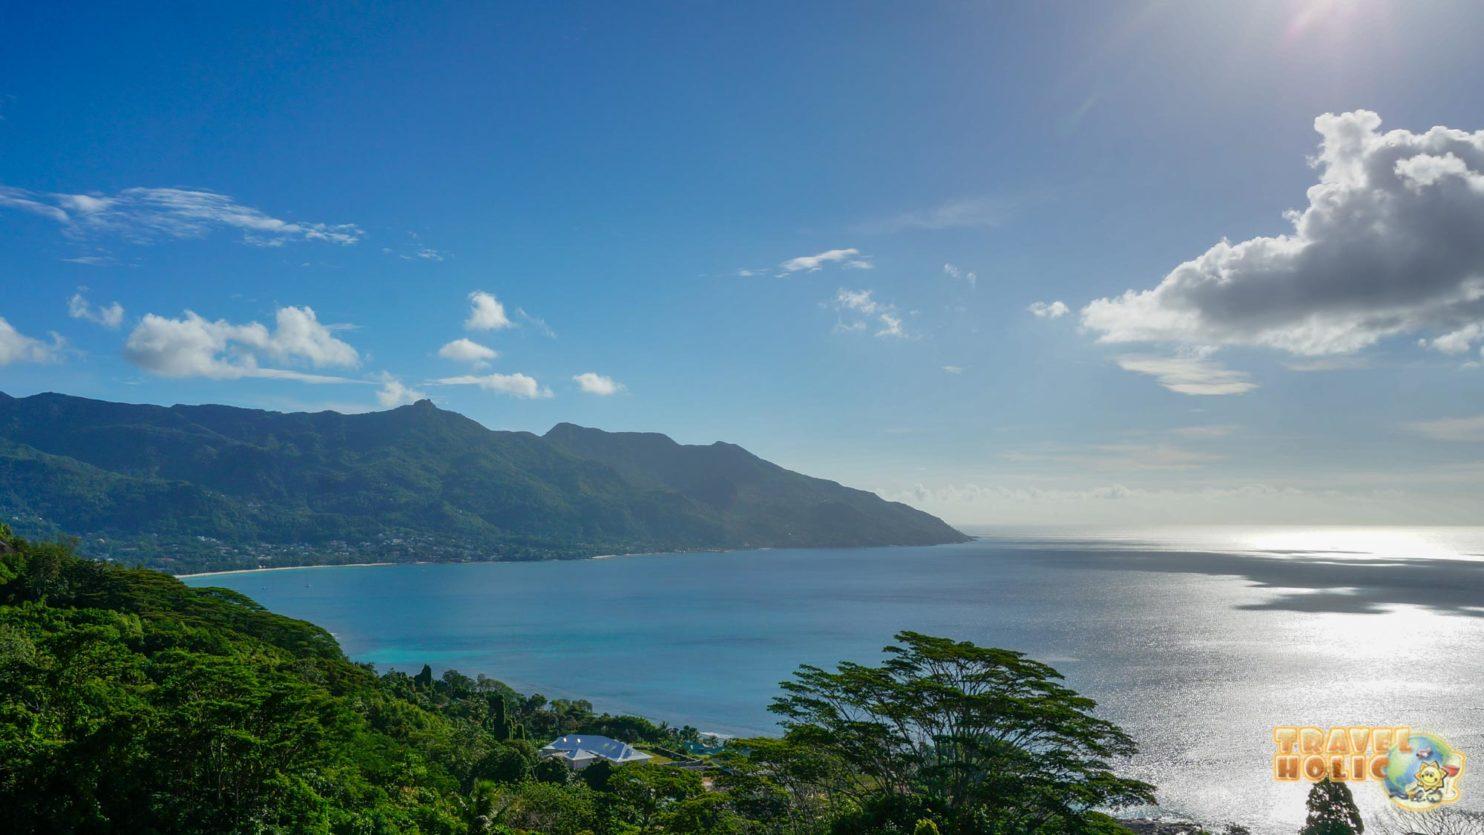 Baie de Beau Vallon, Seychelles